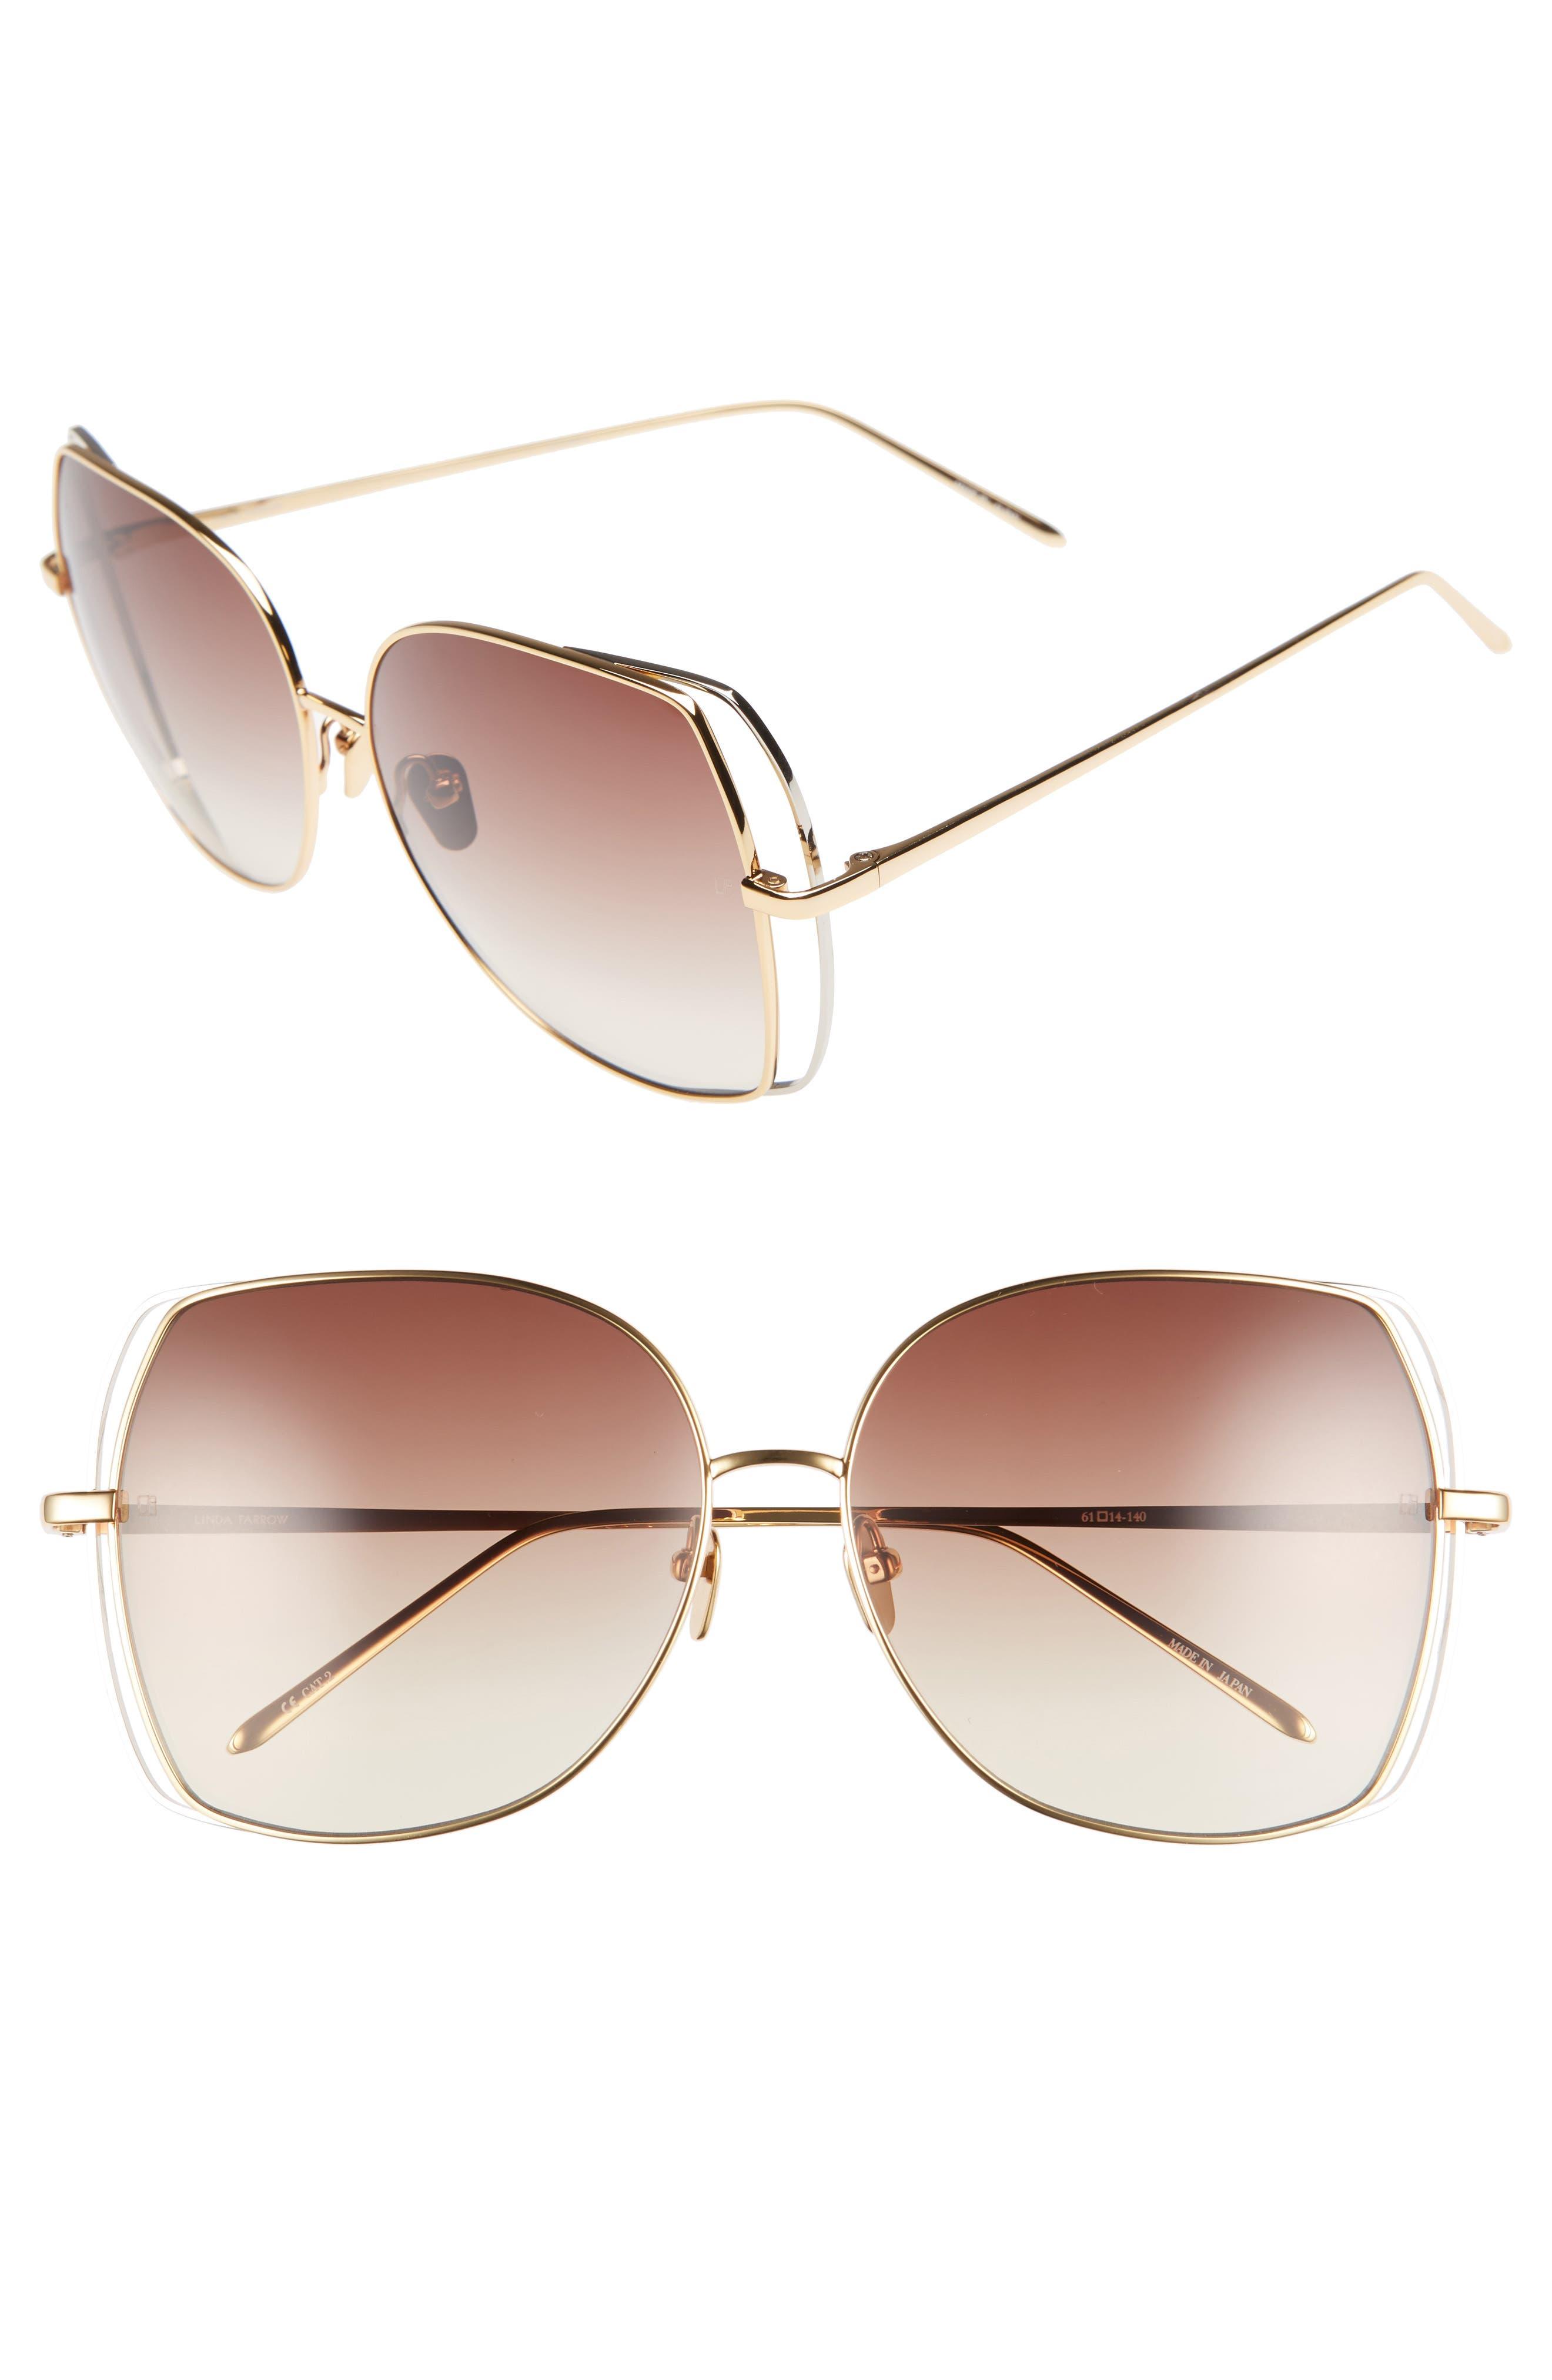 Main Image - Linda Farrow 61mm Gradient Lens 18 Karat Gold Sunglasses